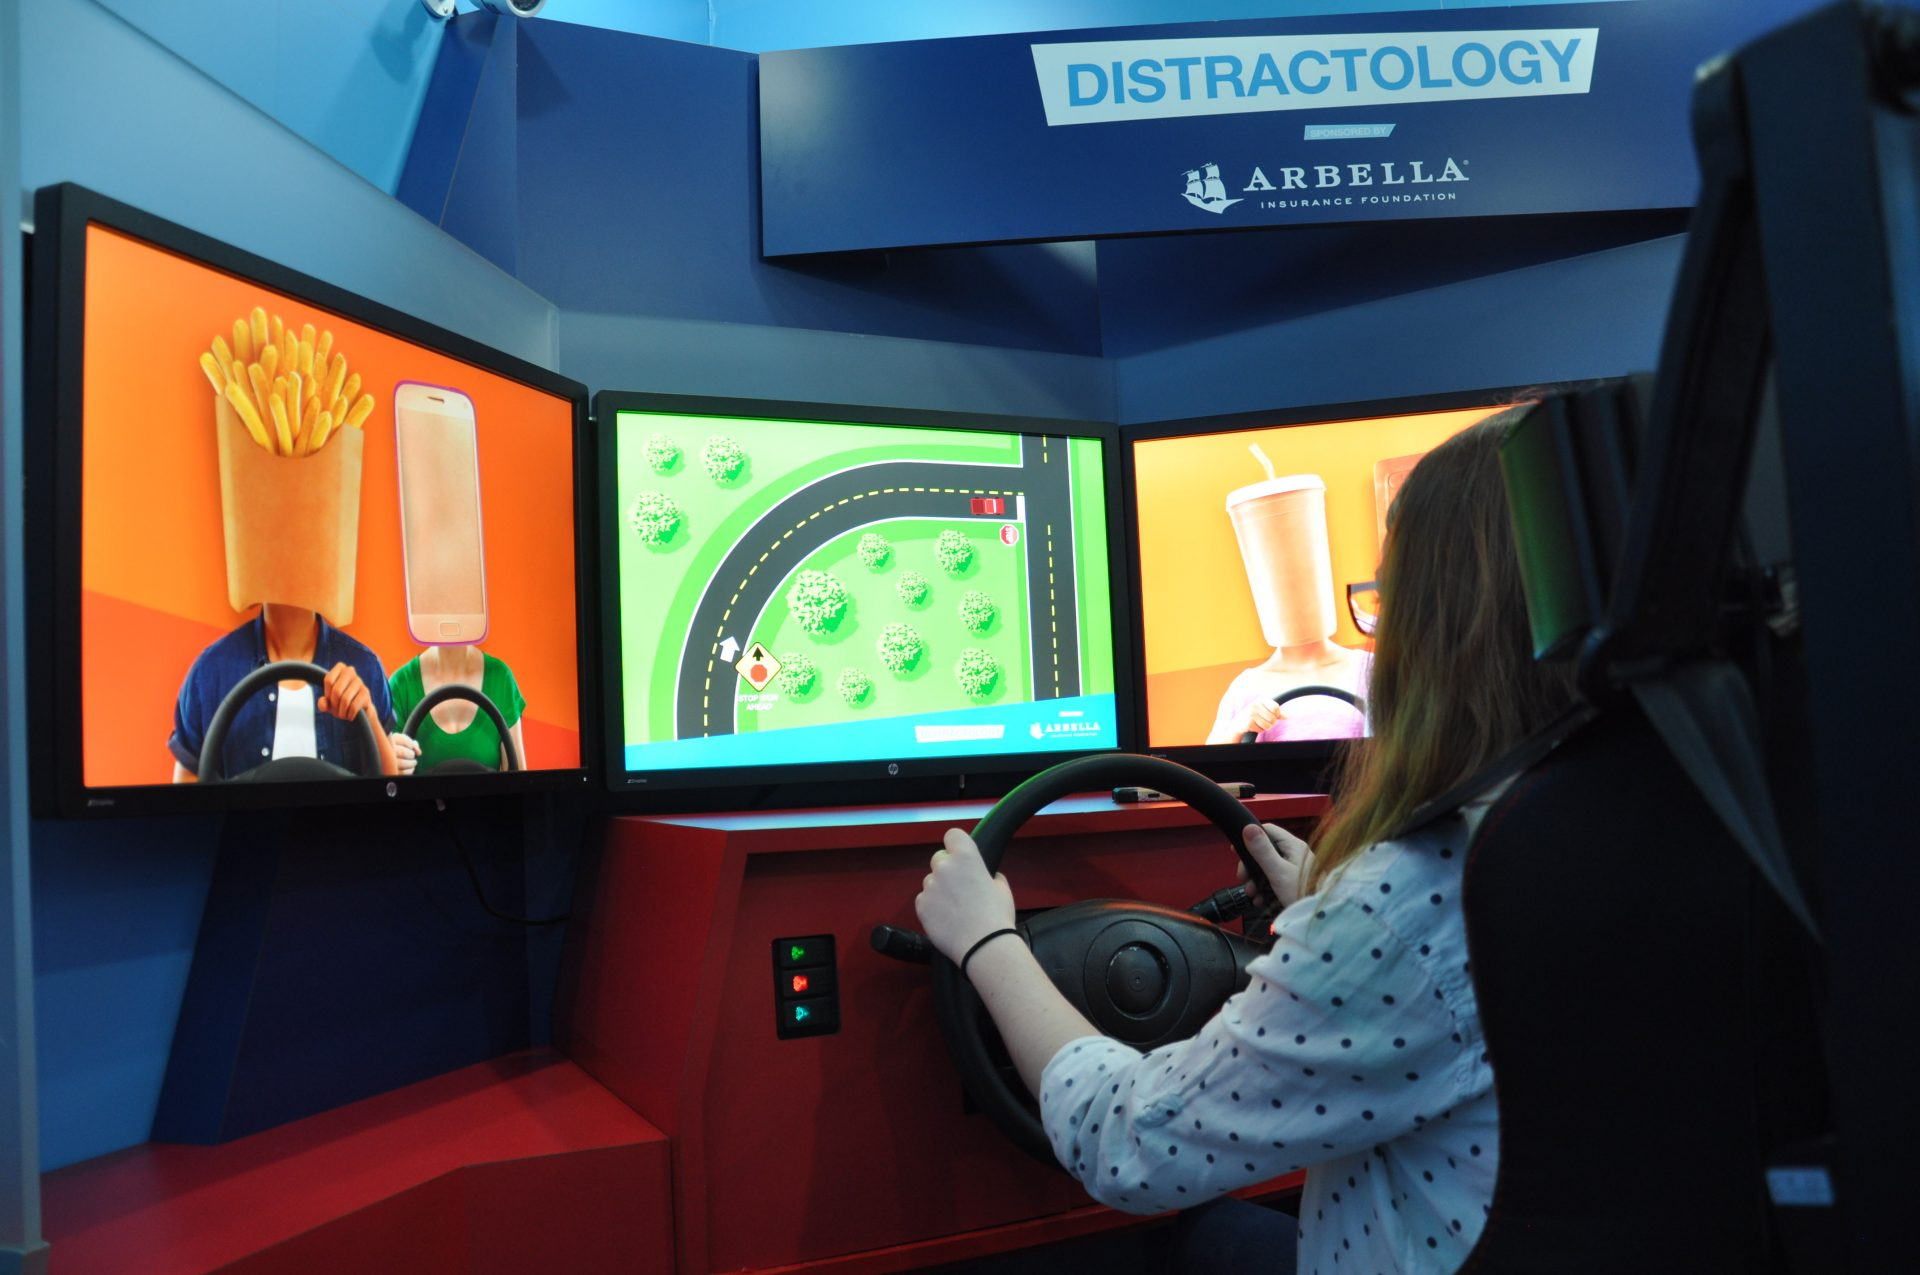 Distractology simulation explaining why participant crashed